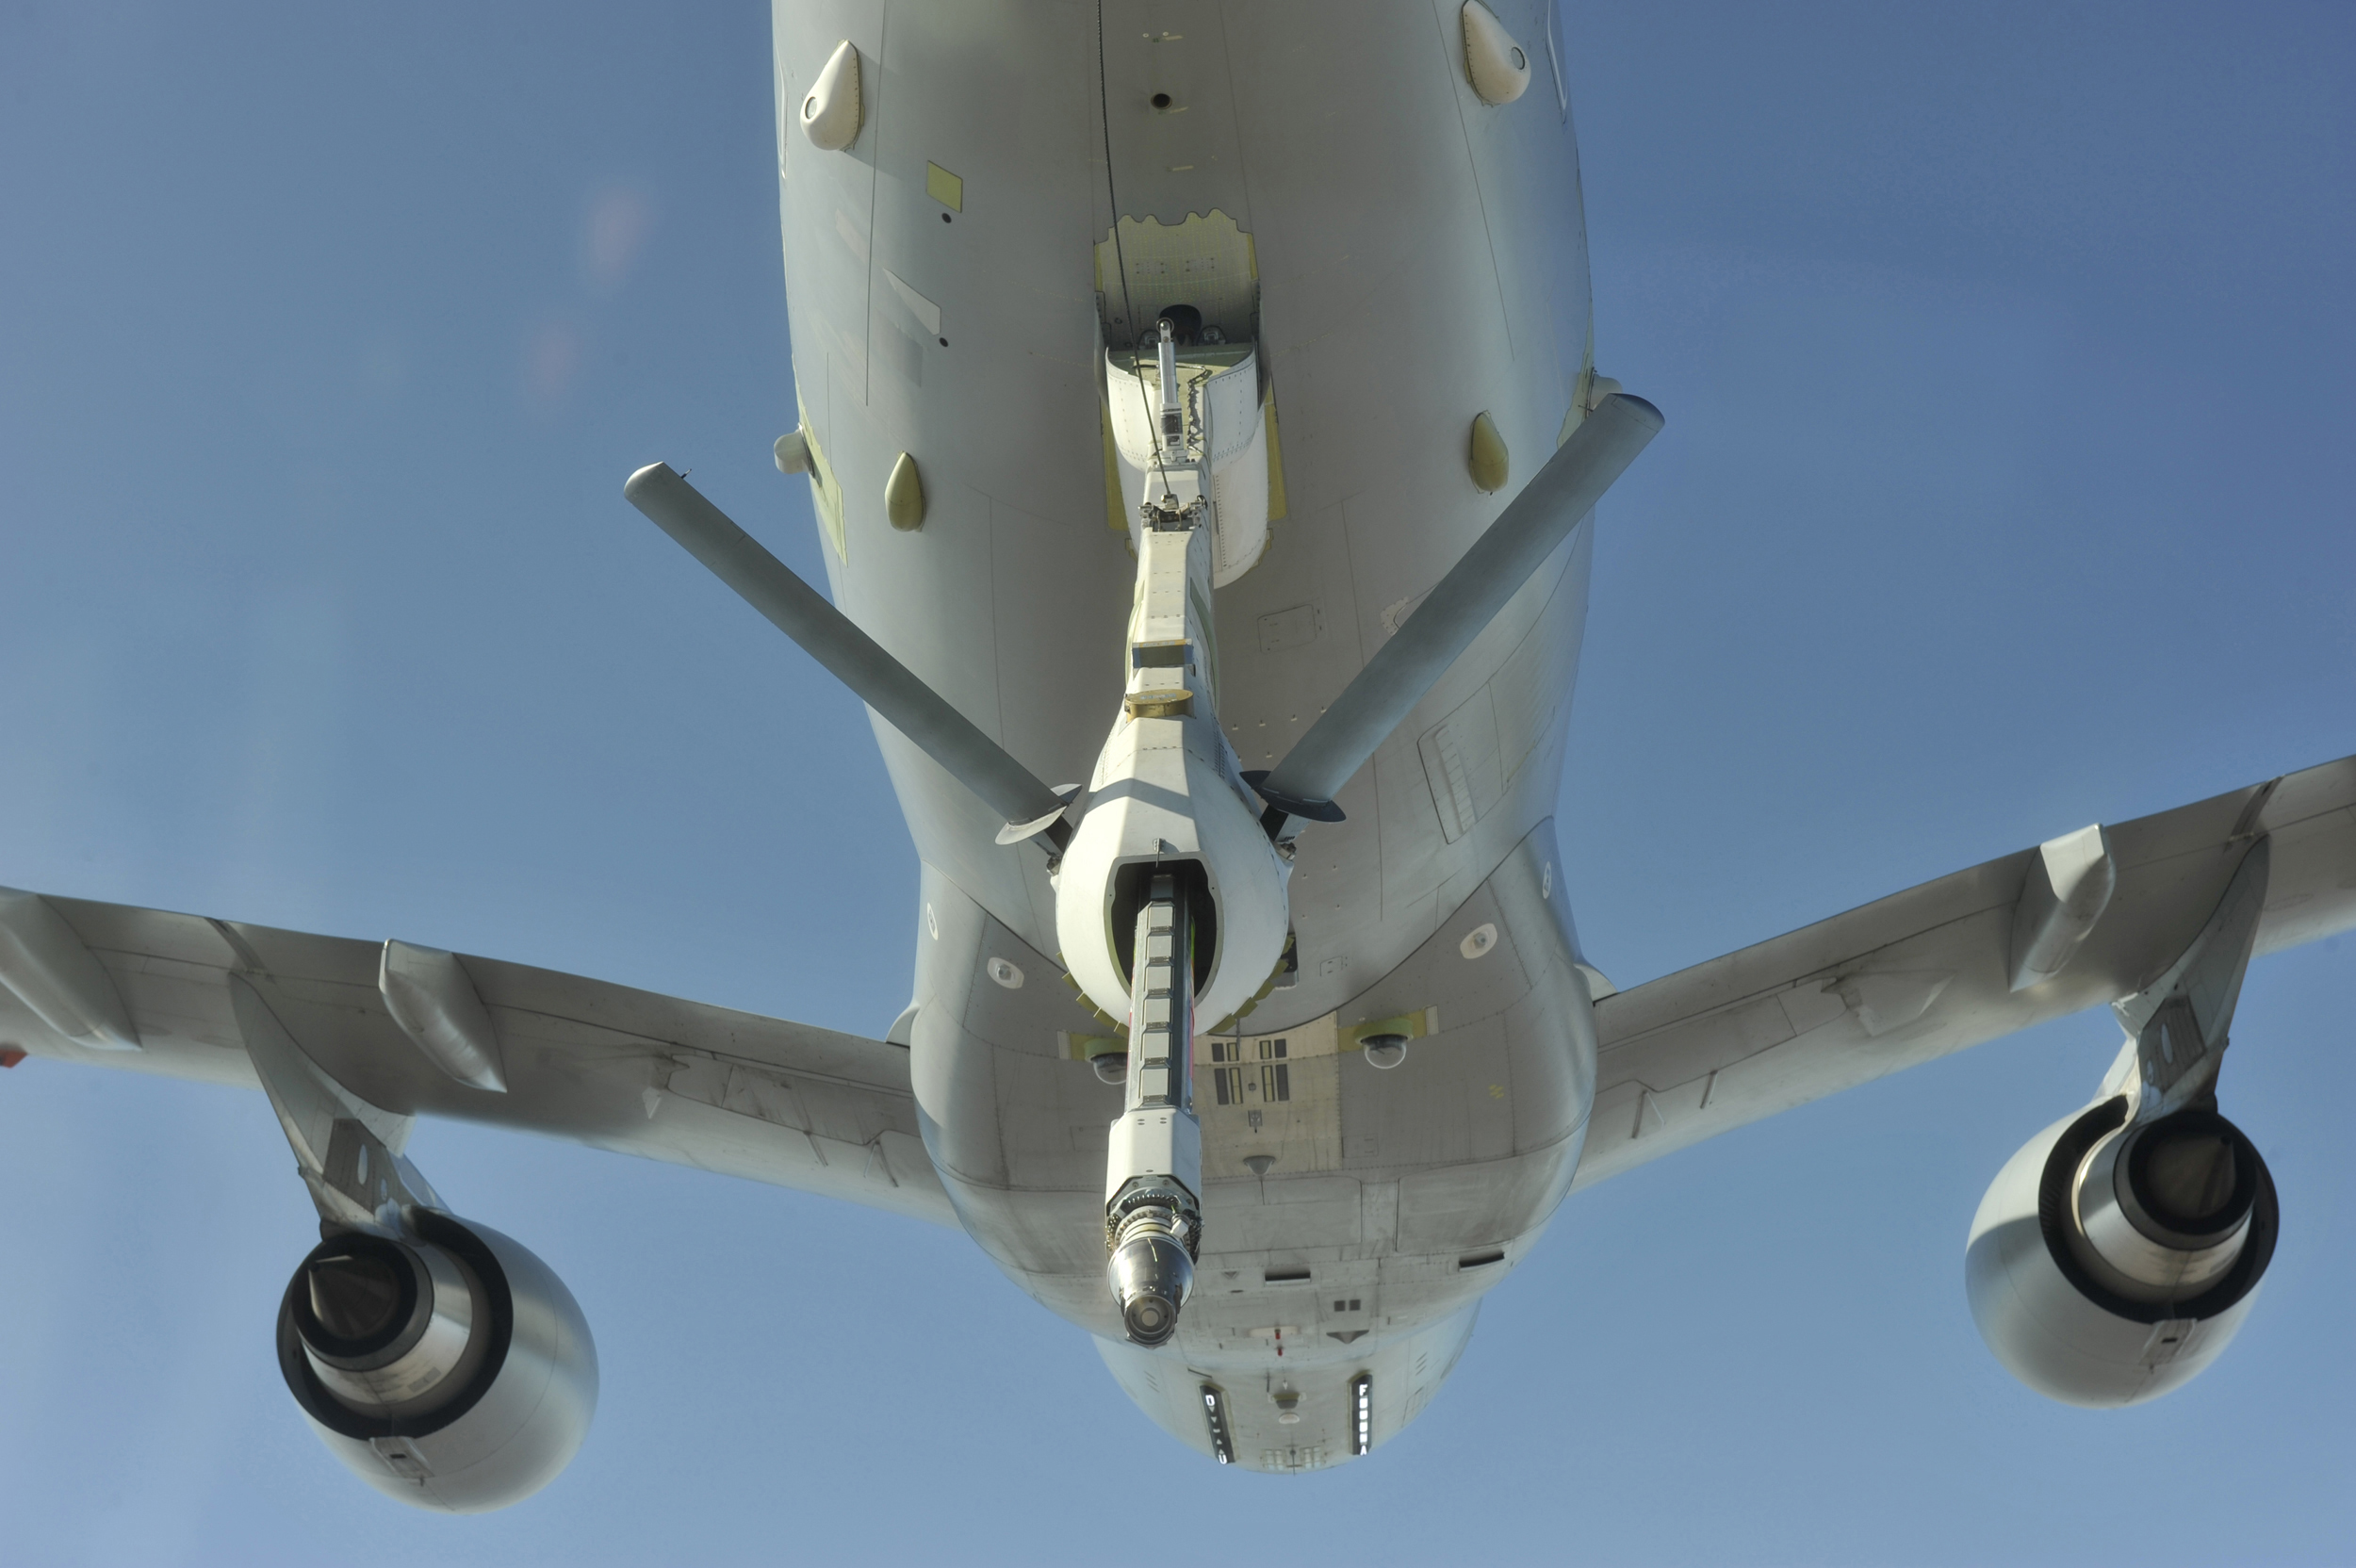 http://www.aeroplans.fr/images/aeroplans/a330_mrtt/sursaut_politique/005-aerial-refuelling-boom-system-arbs-on-raaf-a330-mrtt-kc-30ahr.jpg